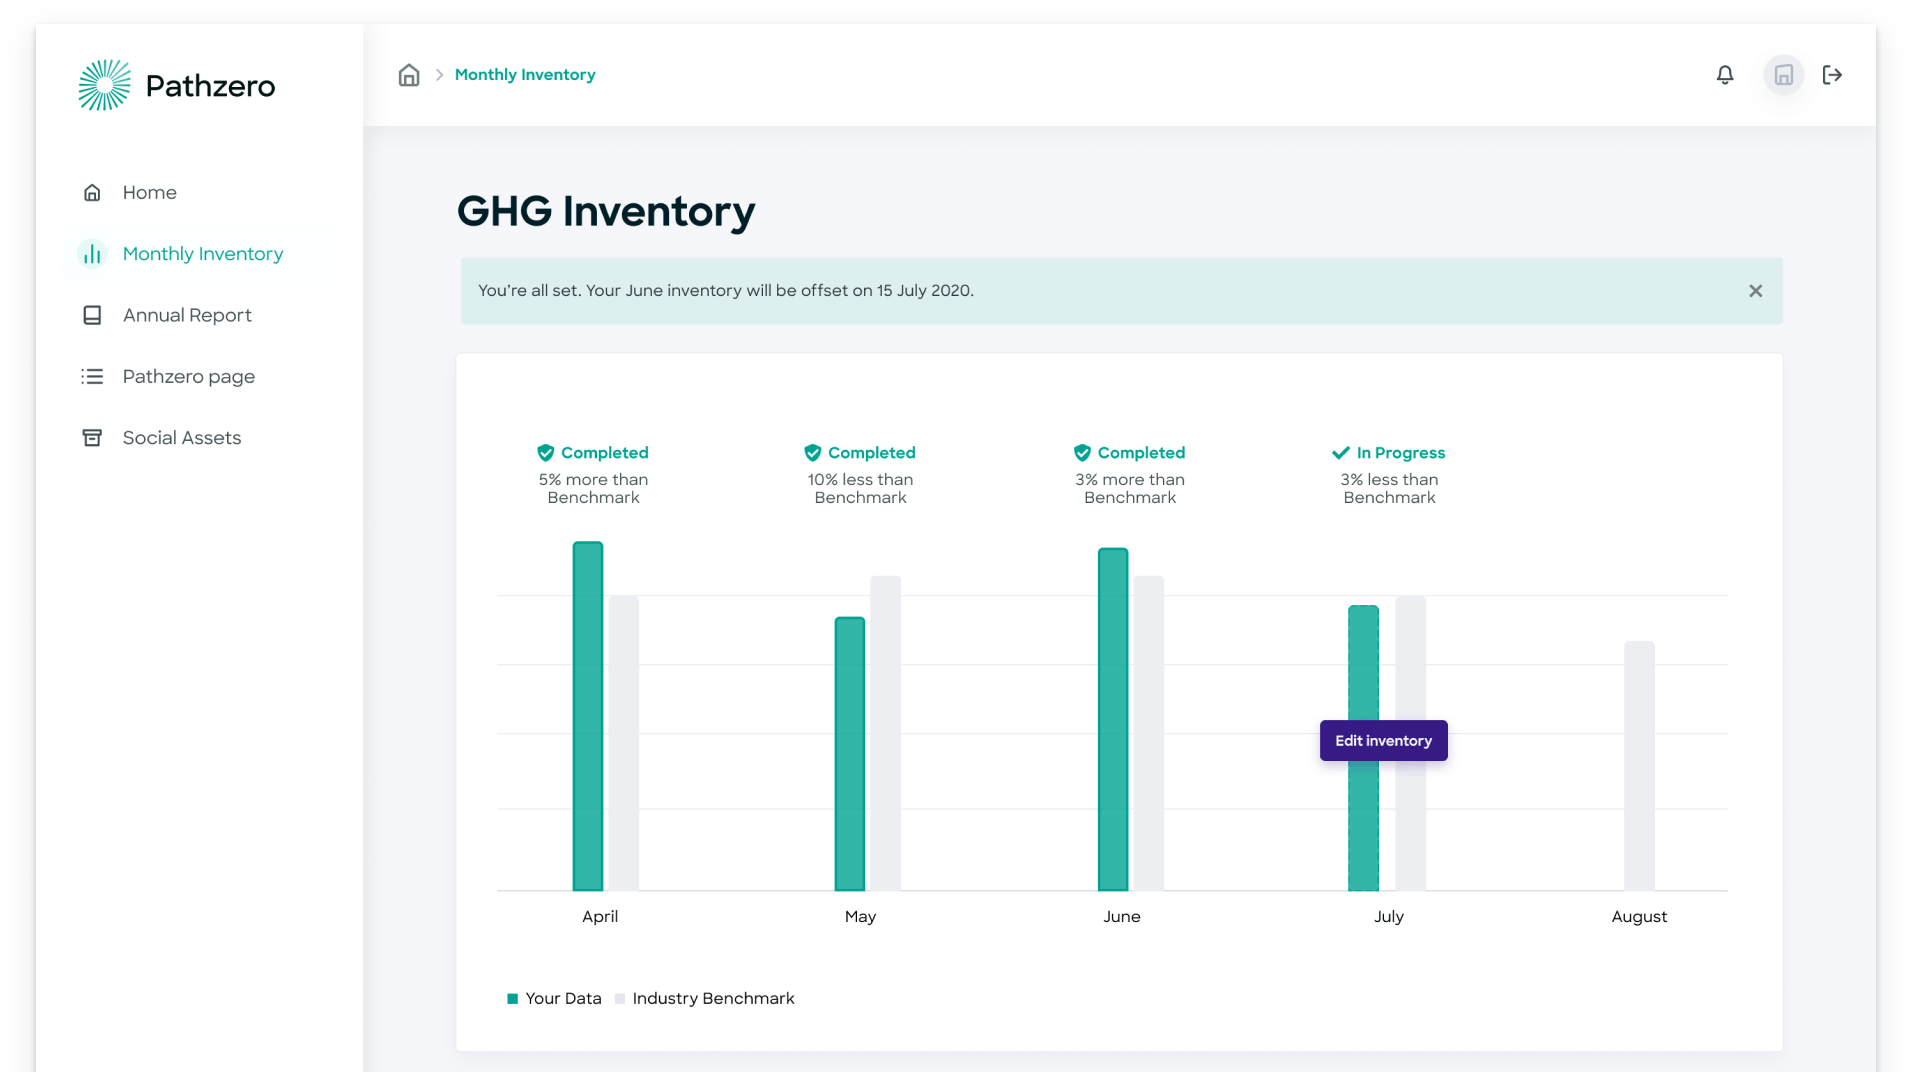 GHG Inventory graph